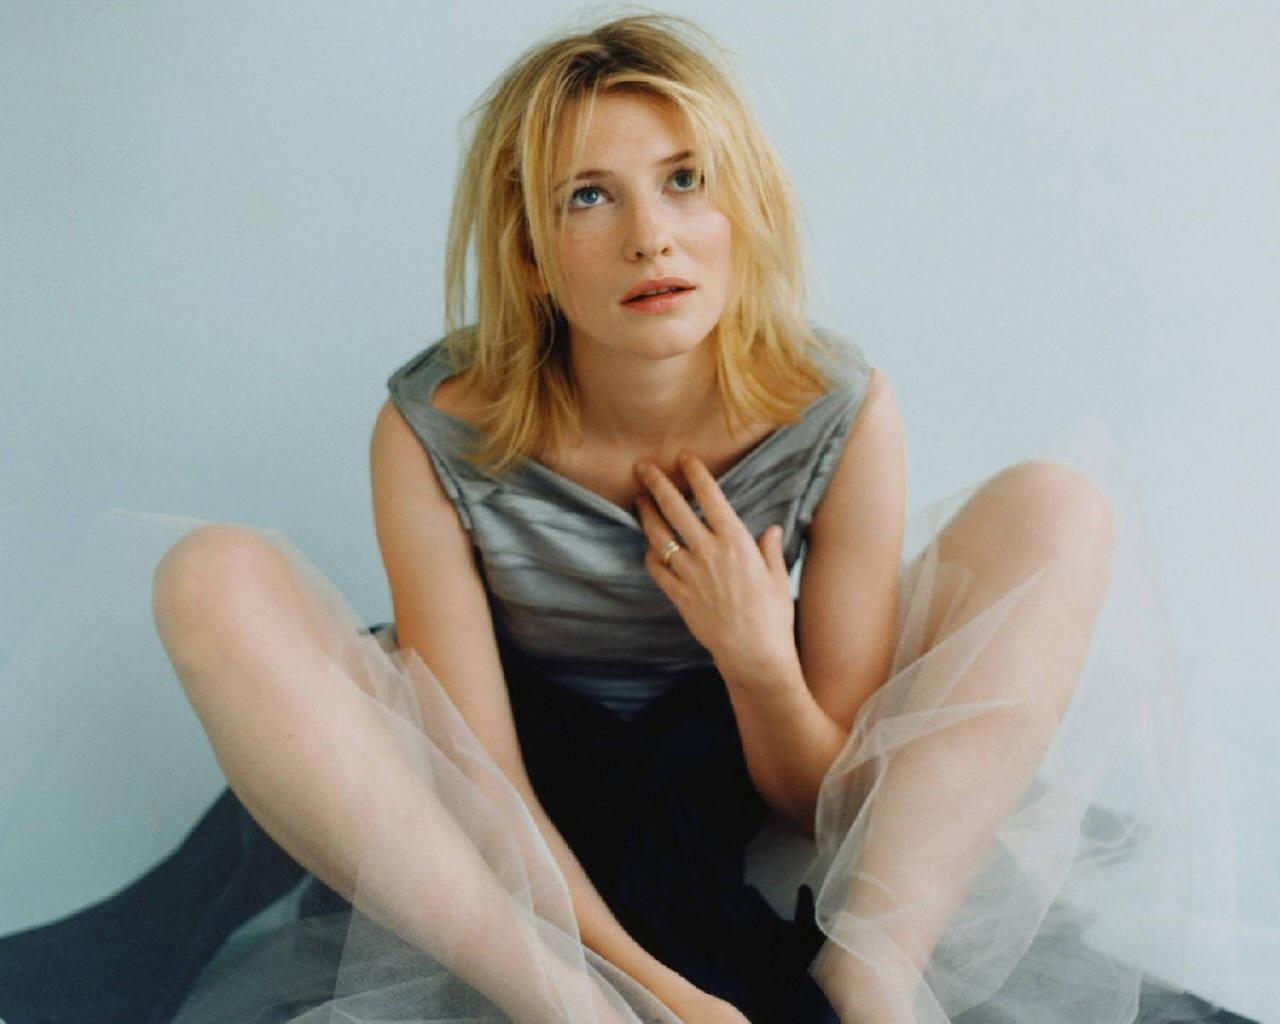 Feet Cate Blanchett nudes (61 photo), Ass, Fappening, Twitter, in bikini 2006